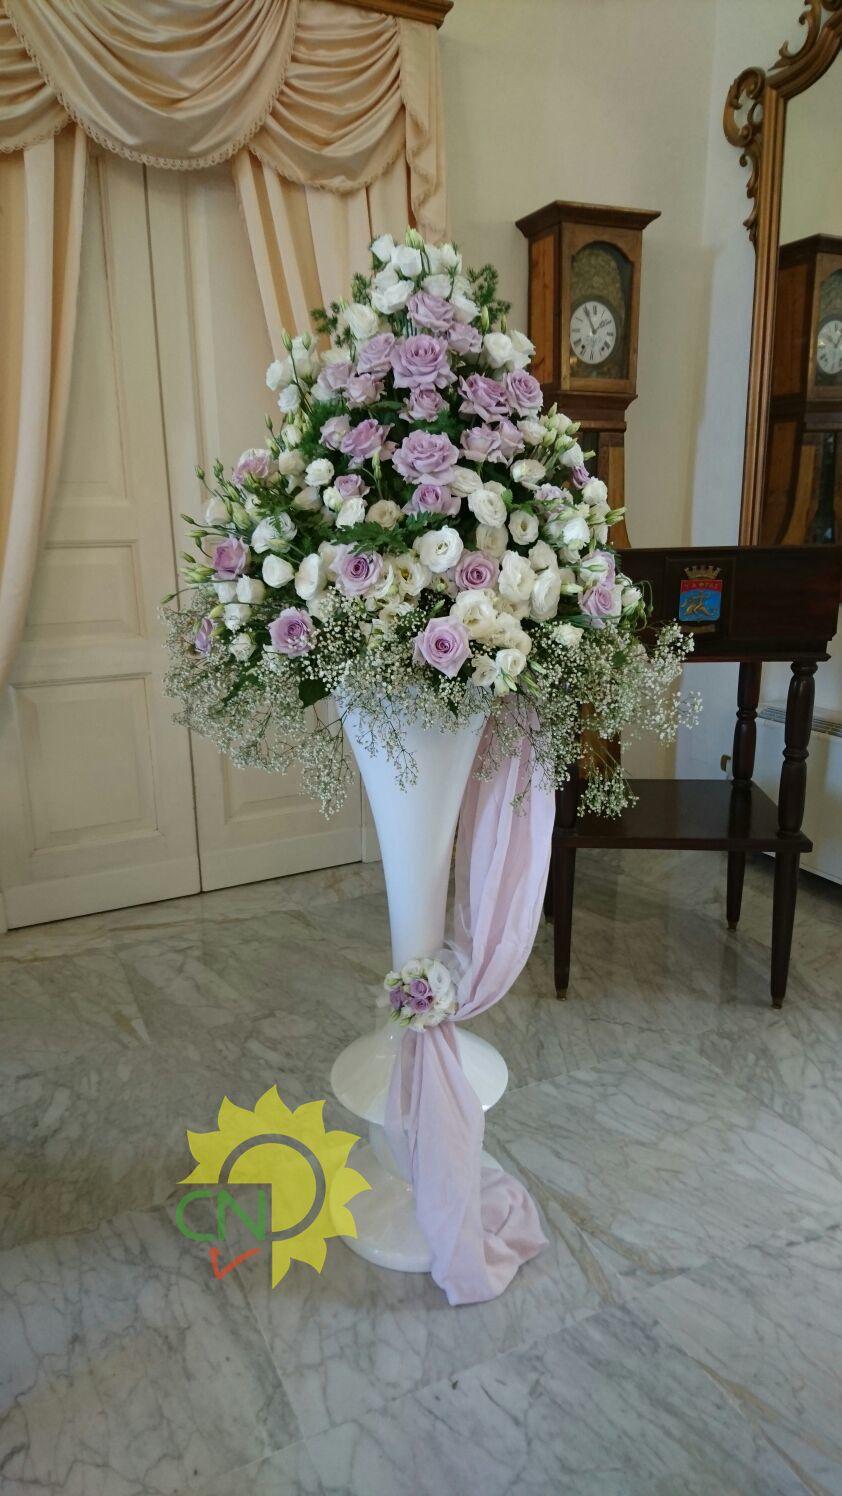 Sposa A Giugno Addobbi Floreali Matrimonio Composizioni Floreali Matrimonio Composizioni Di Fiori Bianchi